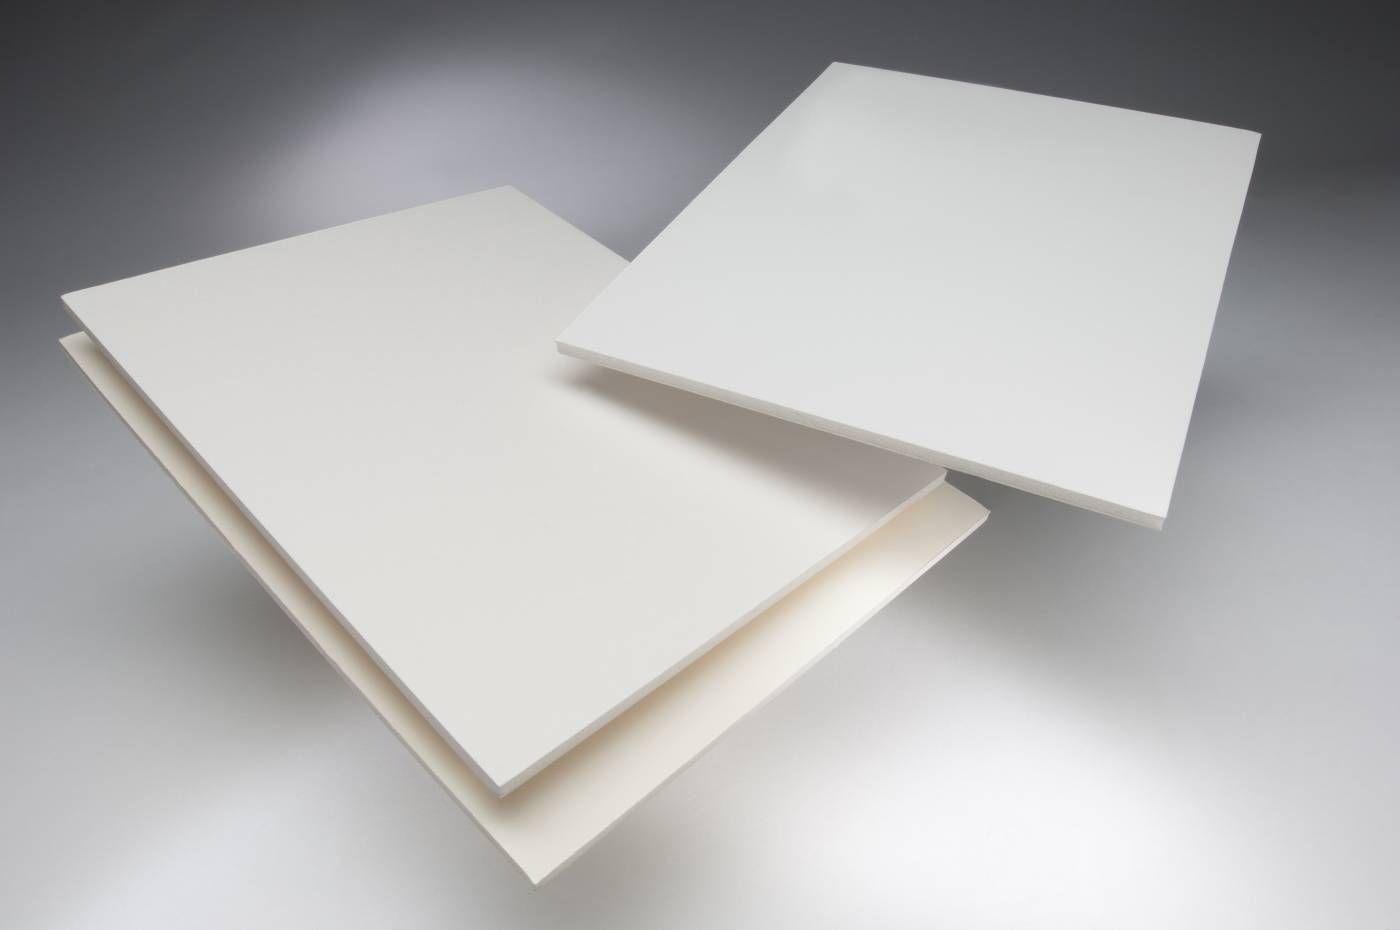 Placa Foam Board Paper A2 5 mm x 420 mm x 594 mm Pacote com 25 - Branca